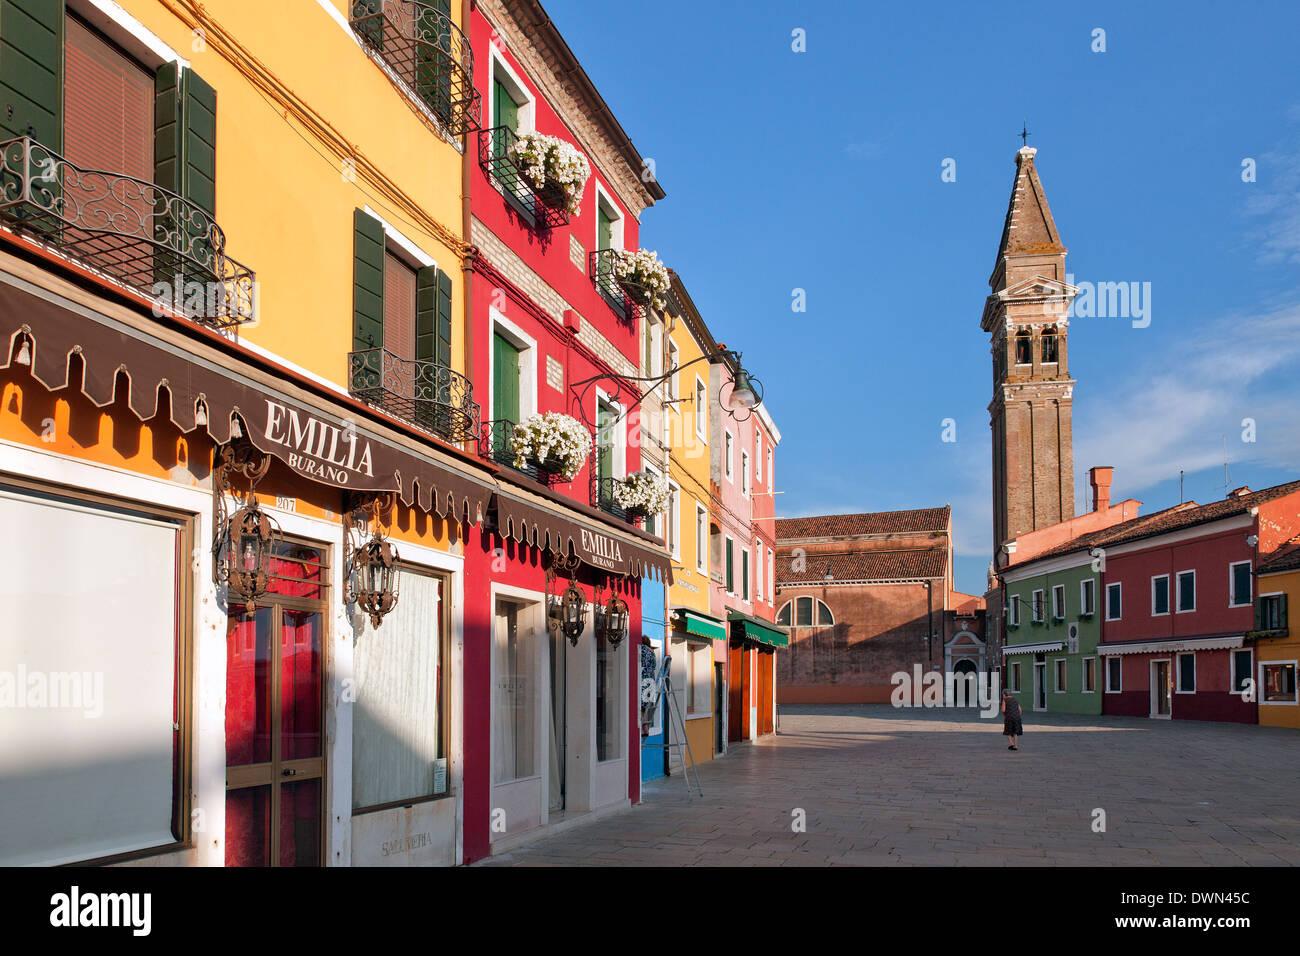 Burano, Venice - The tilting tower of the church San Martini, Italy; Chiesa di San Martini - Stock Image